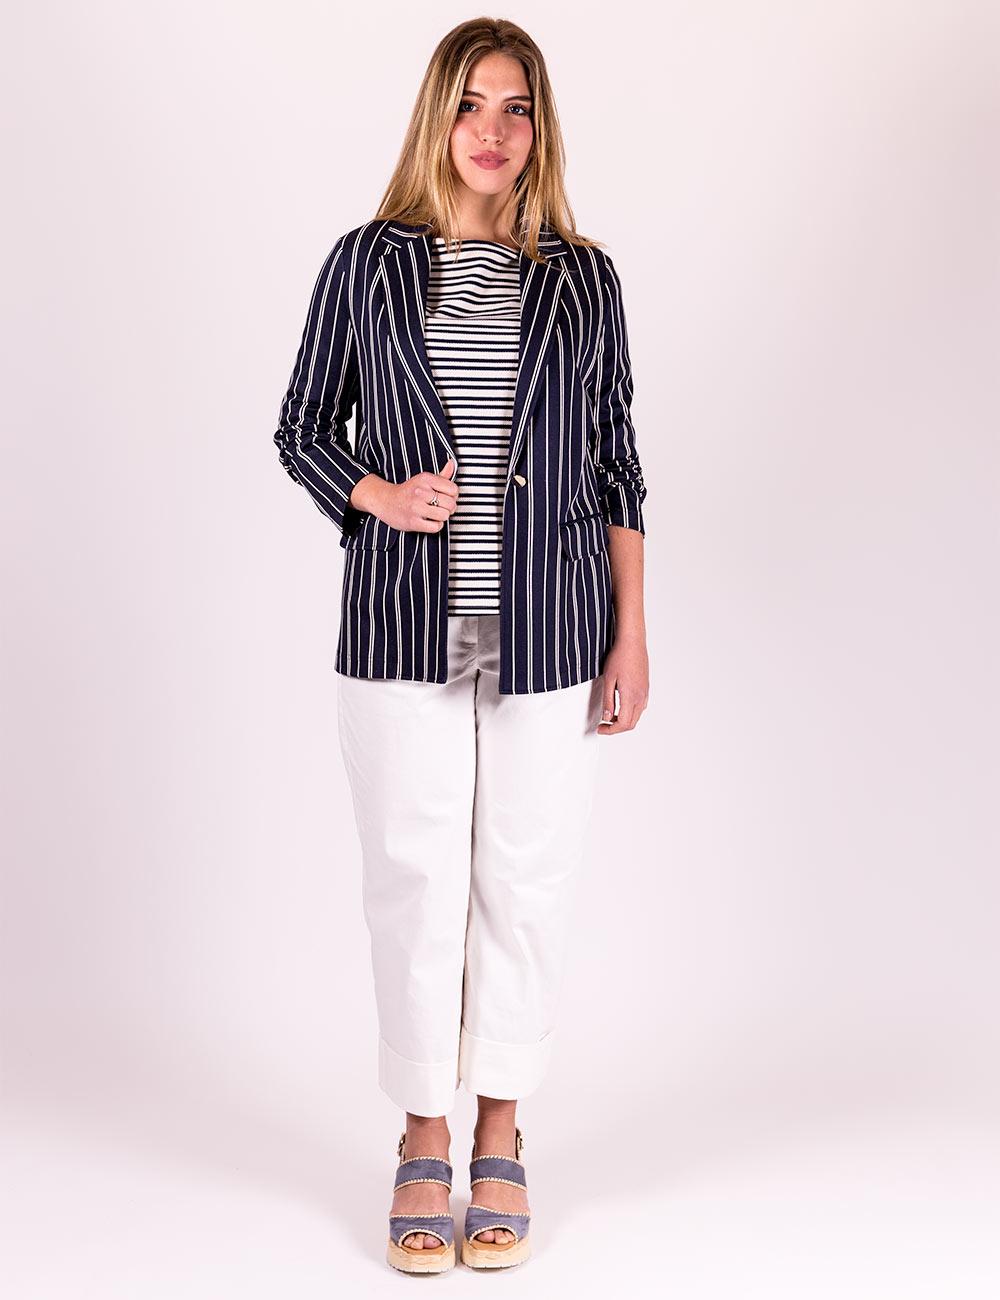 Pennyblack - Blazer in jersey jacquard